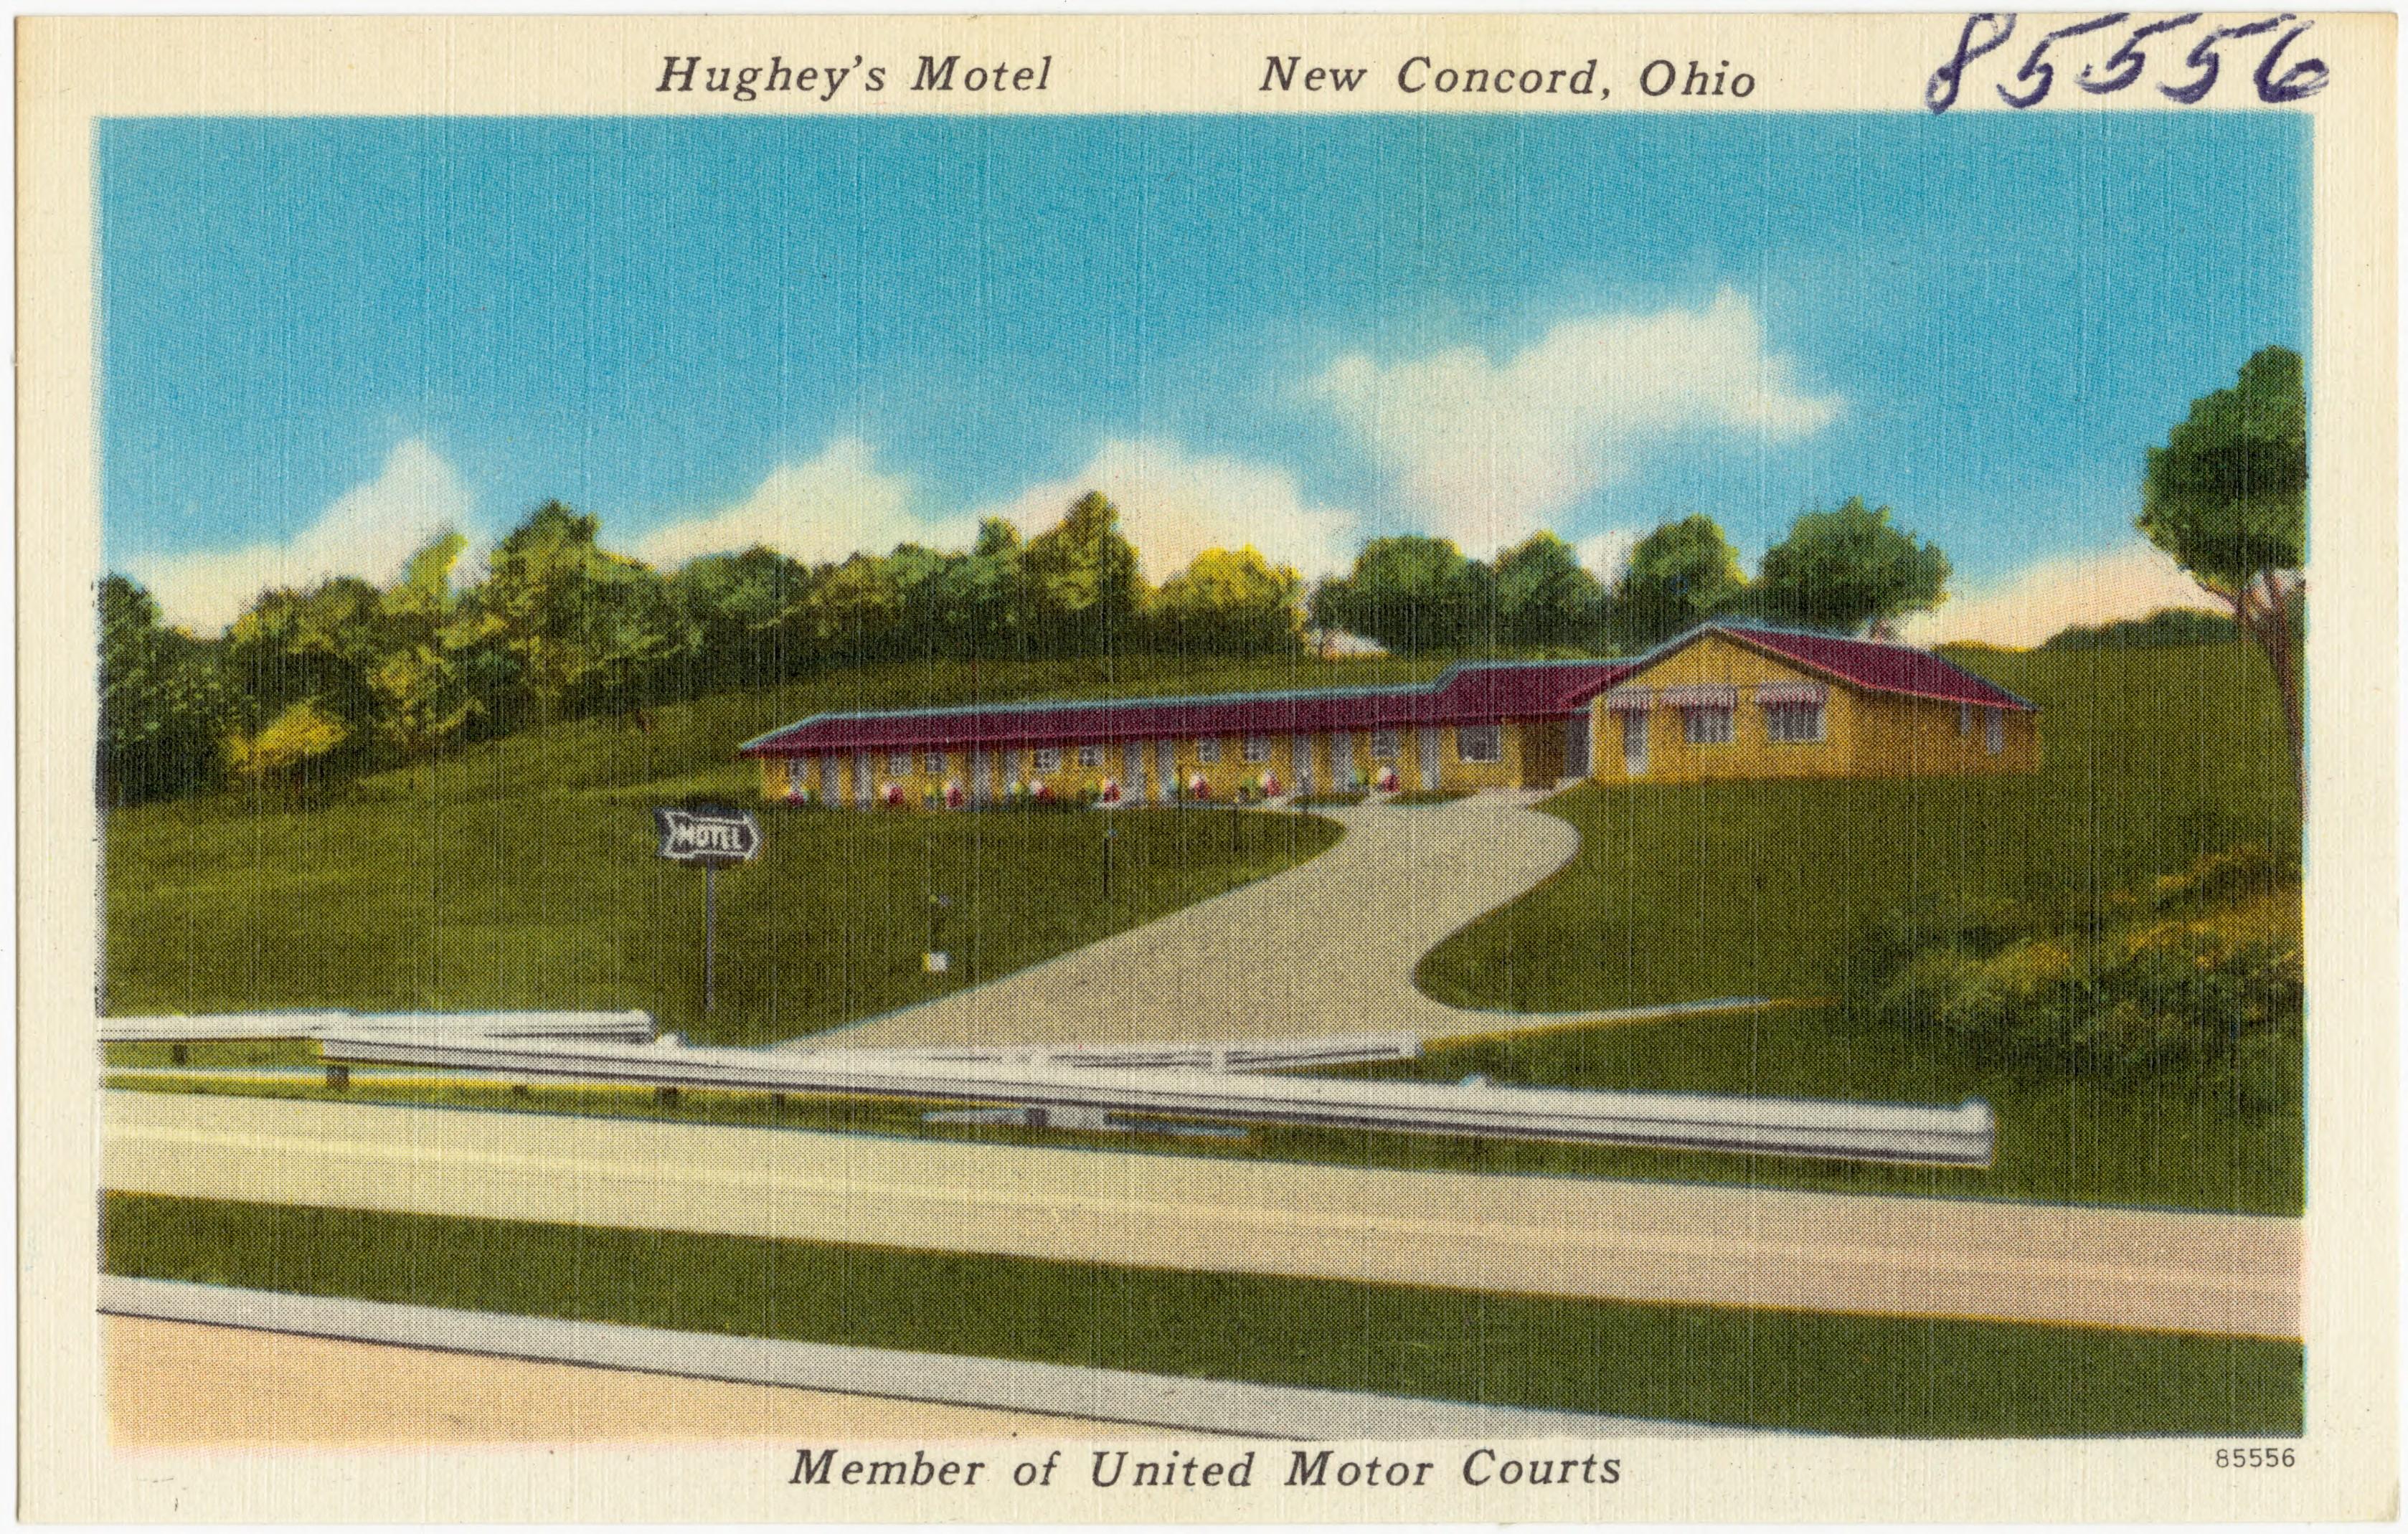 Ohio muskingum county new concord - File Hughey S Motel New Concord Ohio Member Of United States Motor Court